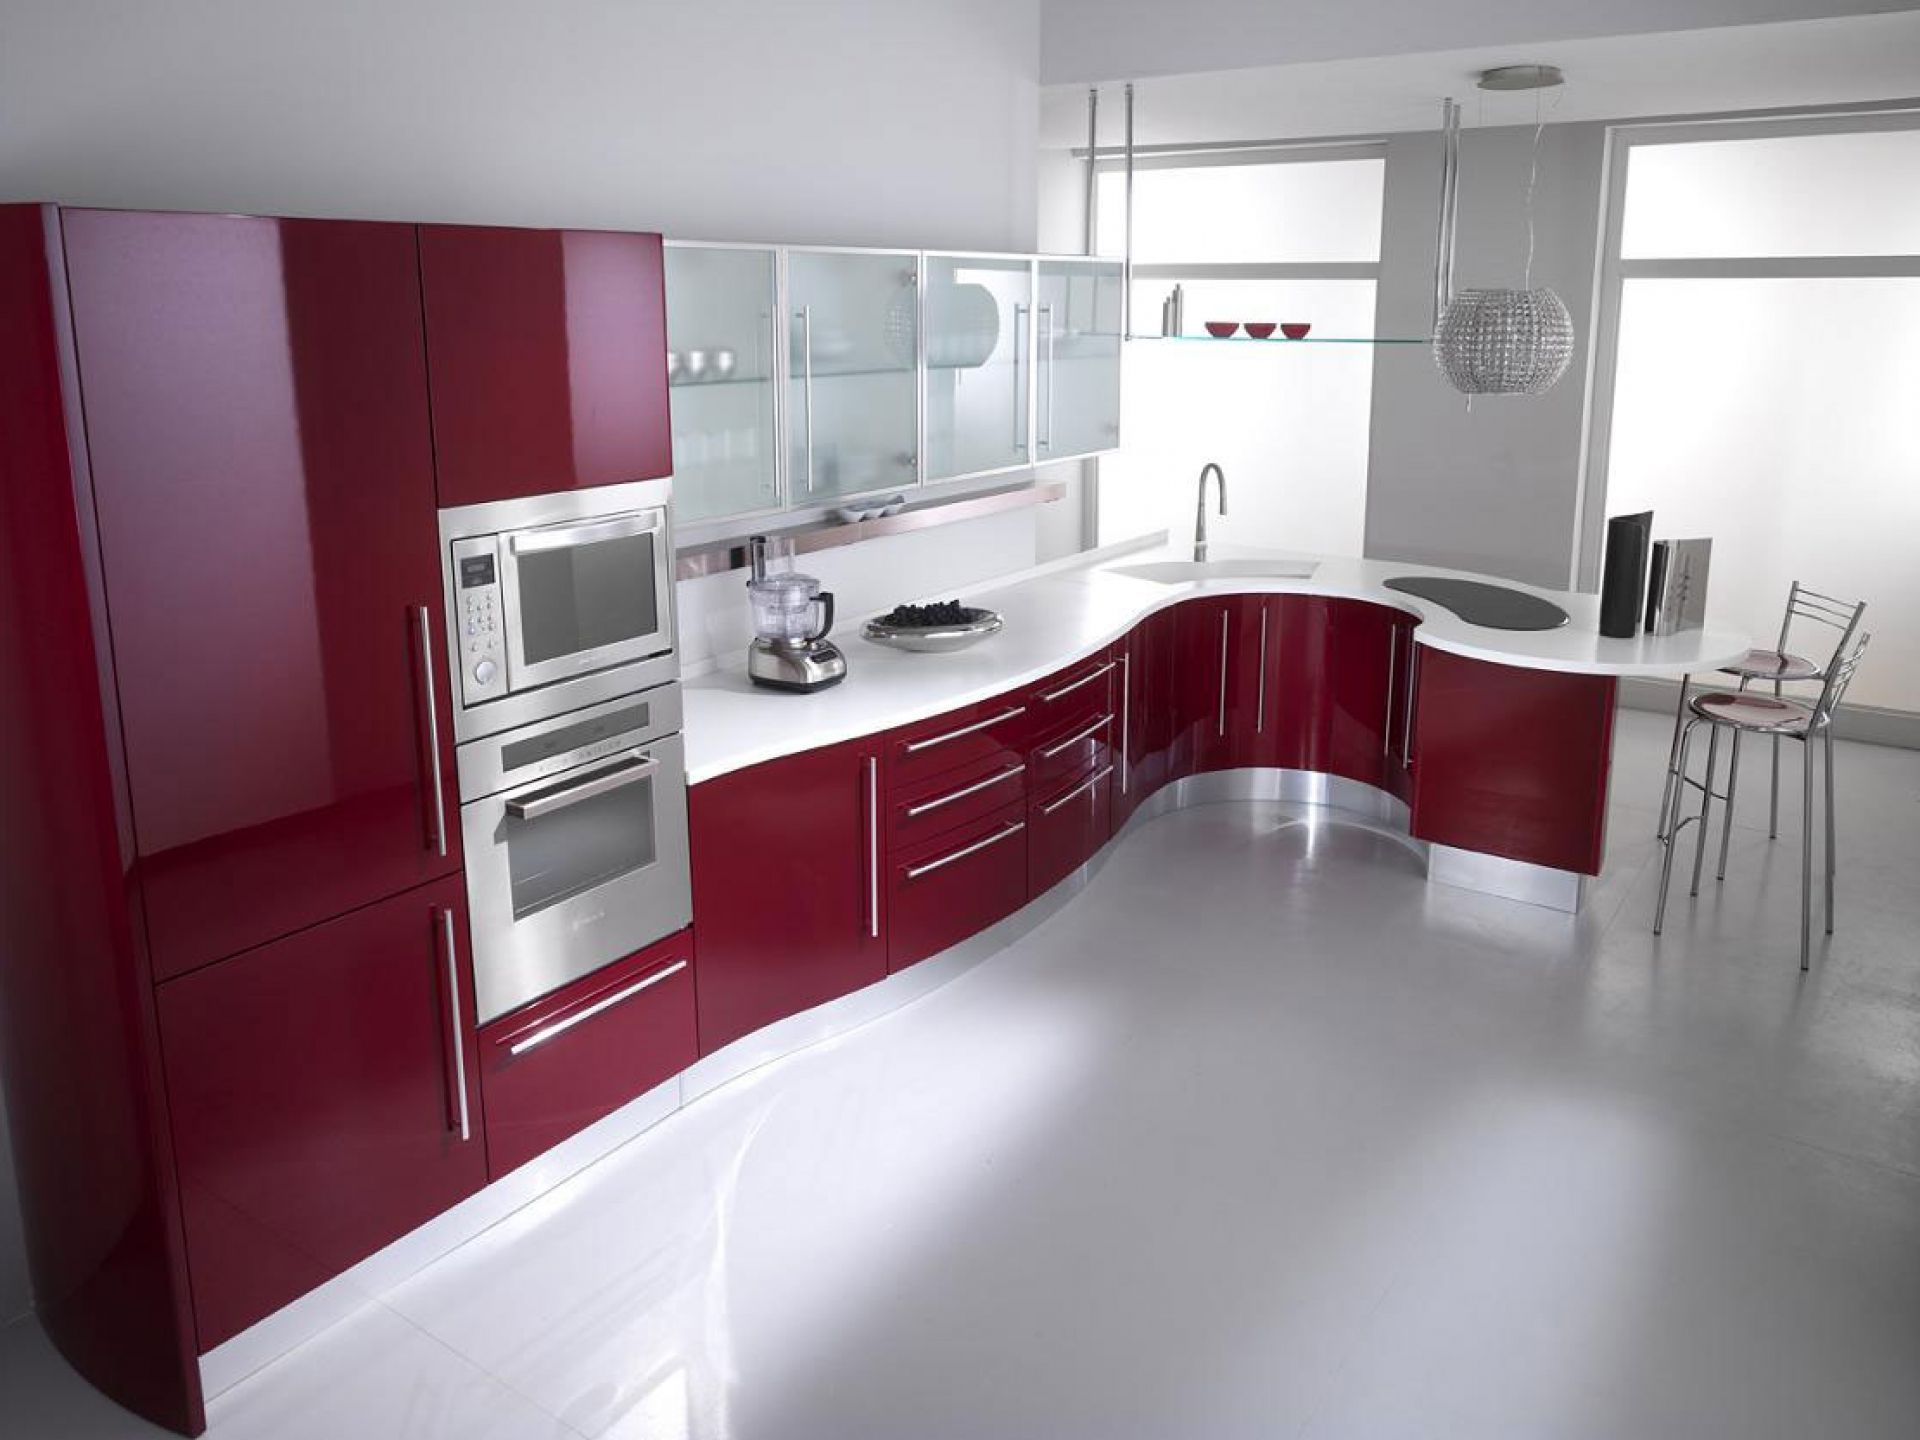 Beautiful Kitchen With Maroon Cabinets And Italian Style Http Www Urbanhomez Com Decors Kitchen Ht Siyah Mutfak Dolaplari Mutfak Dolaplari Mutfak Dekorasyonu